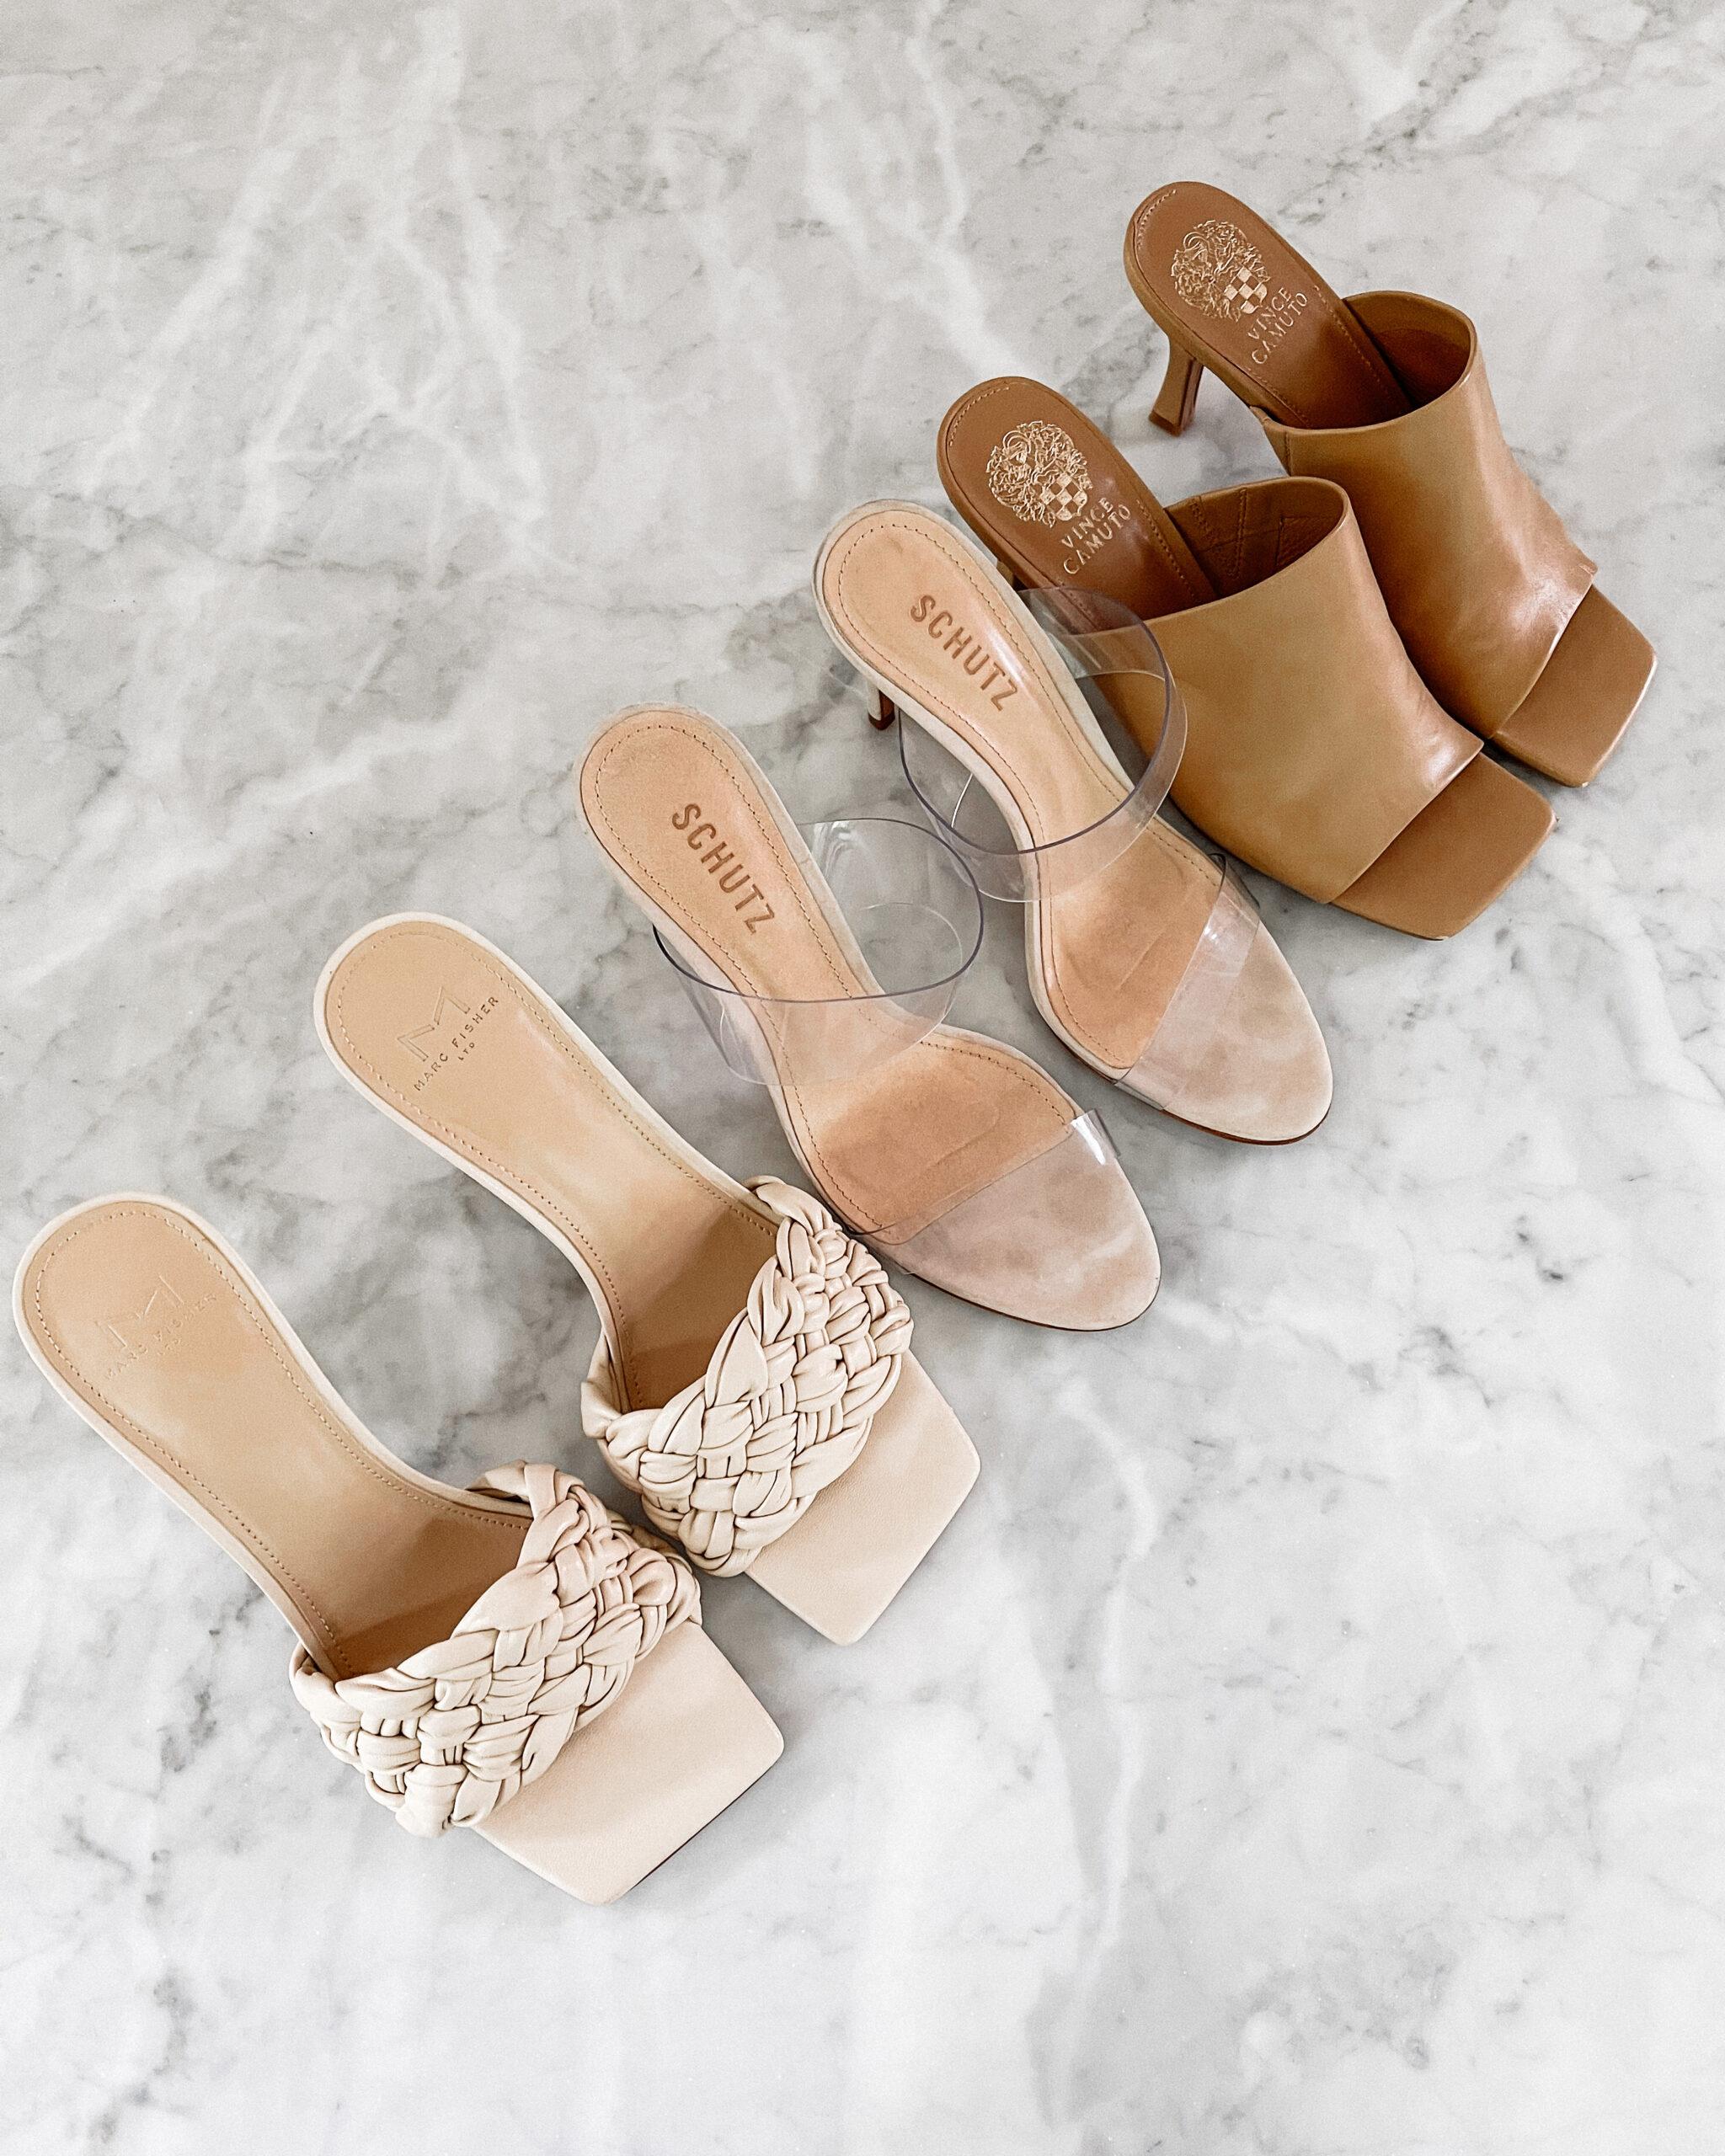 Fashion Jackson dressy summer sandals strappy summer sandals dressy sandals for wedding